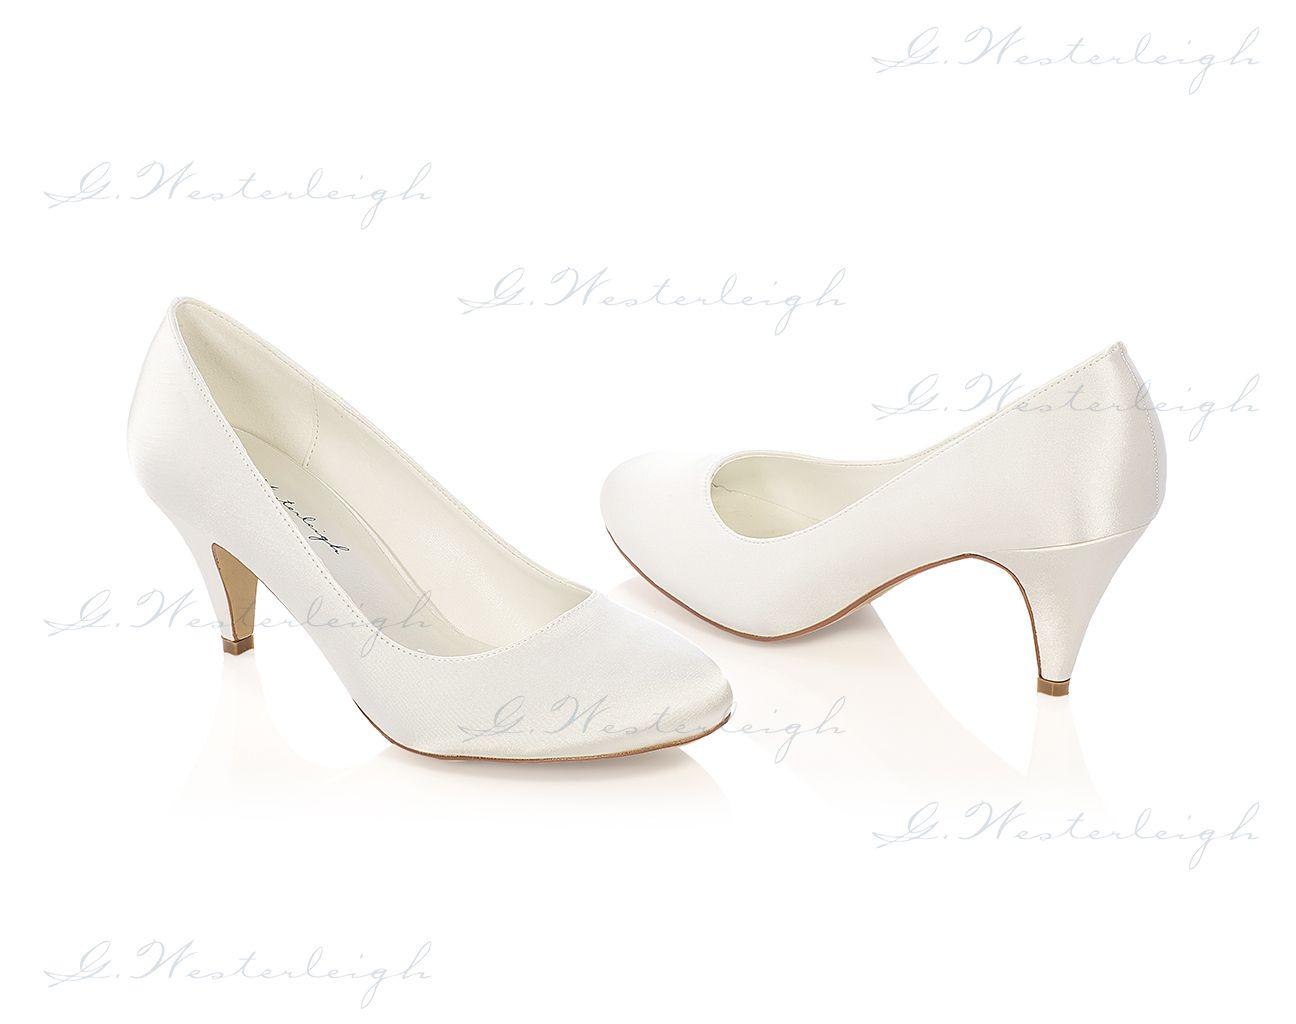 Diana Menyasszonyi cipő     westerleigh.hu  1cda241d0c